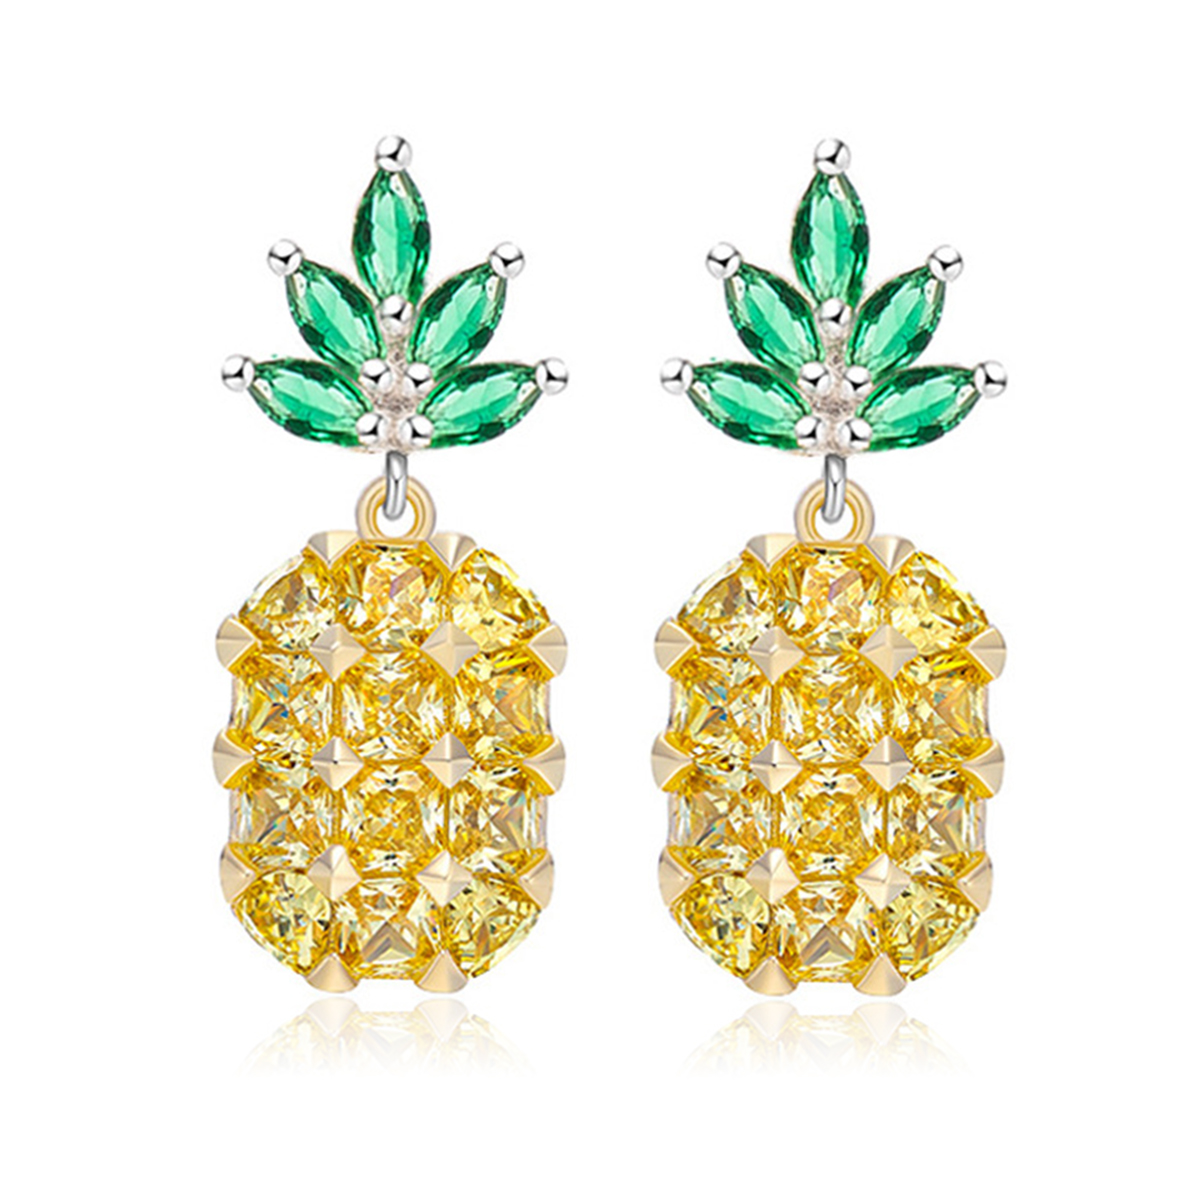 Shellhard Fruit Pineapple Crystal Ear Stud Earring Vintage Pink Yellow Big Gems Silver Earrings For Women Charm Jewelry